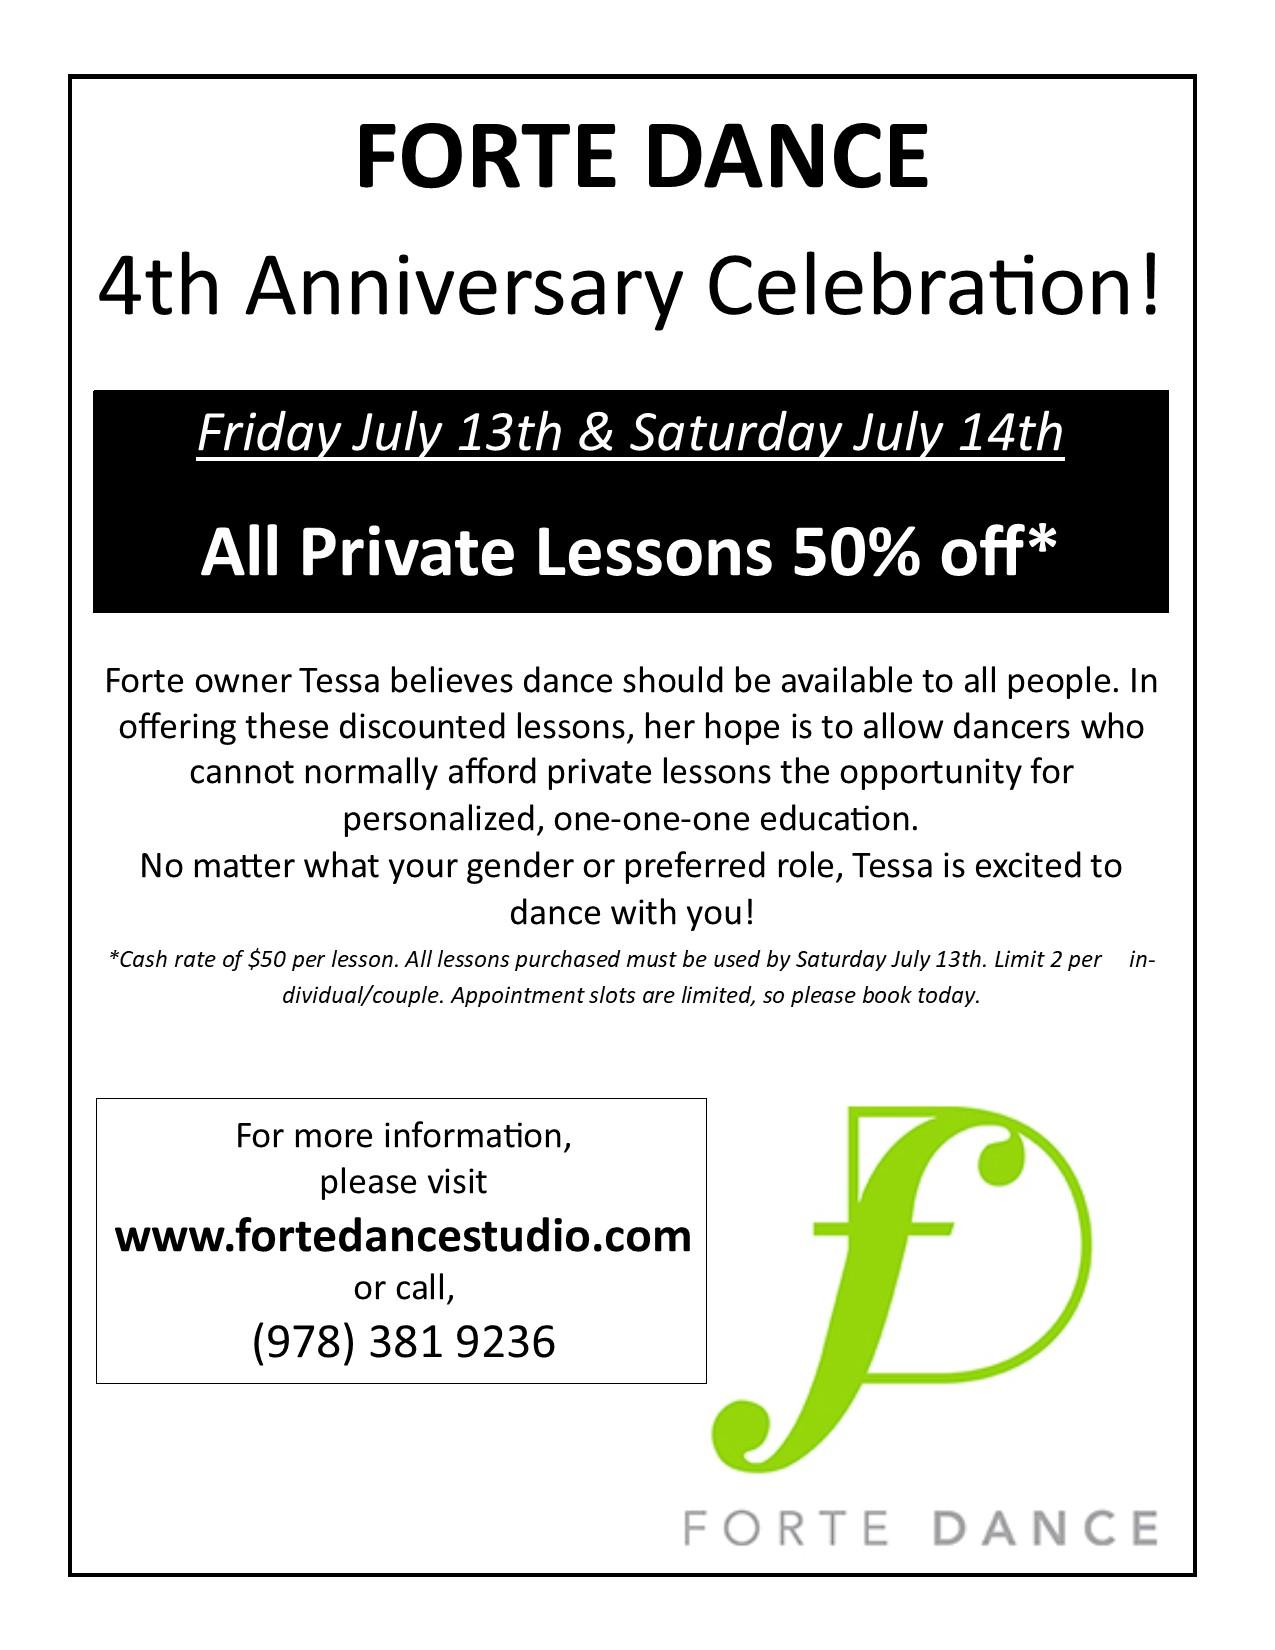 4th Anniversary 50 percent off lessons.jpg